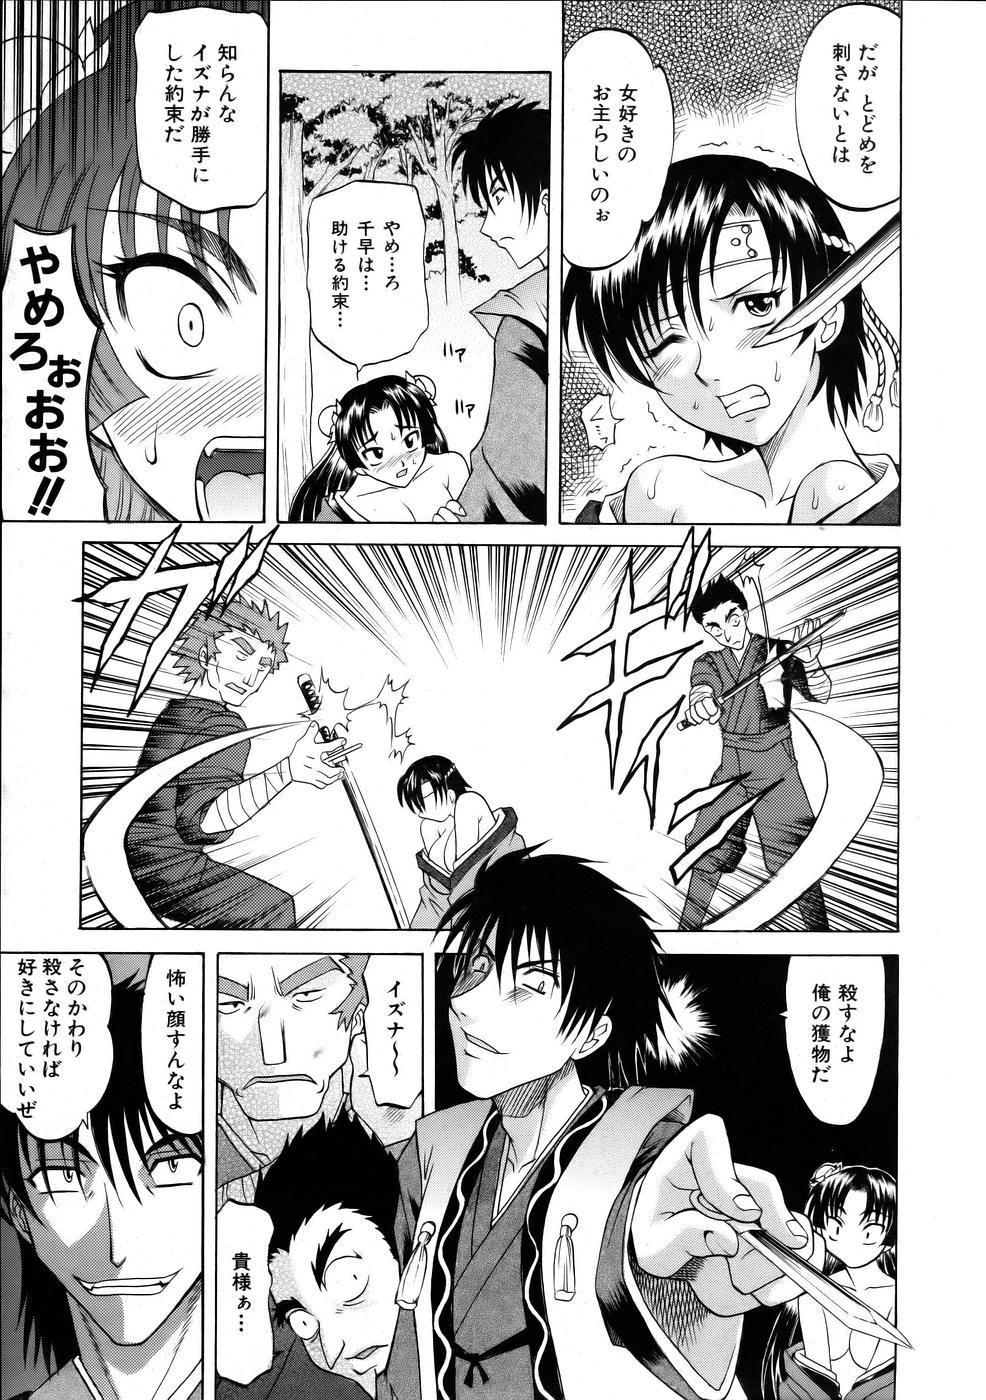 COMIC AUN 2005-10 Vol. 113 60